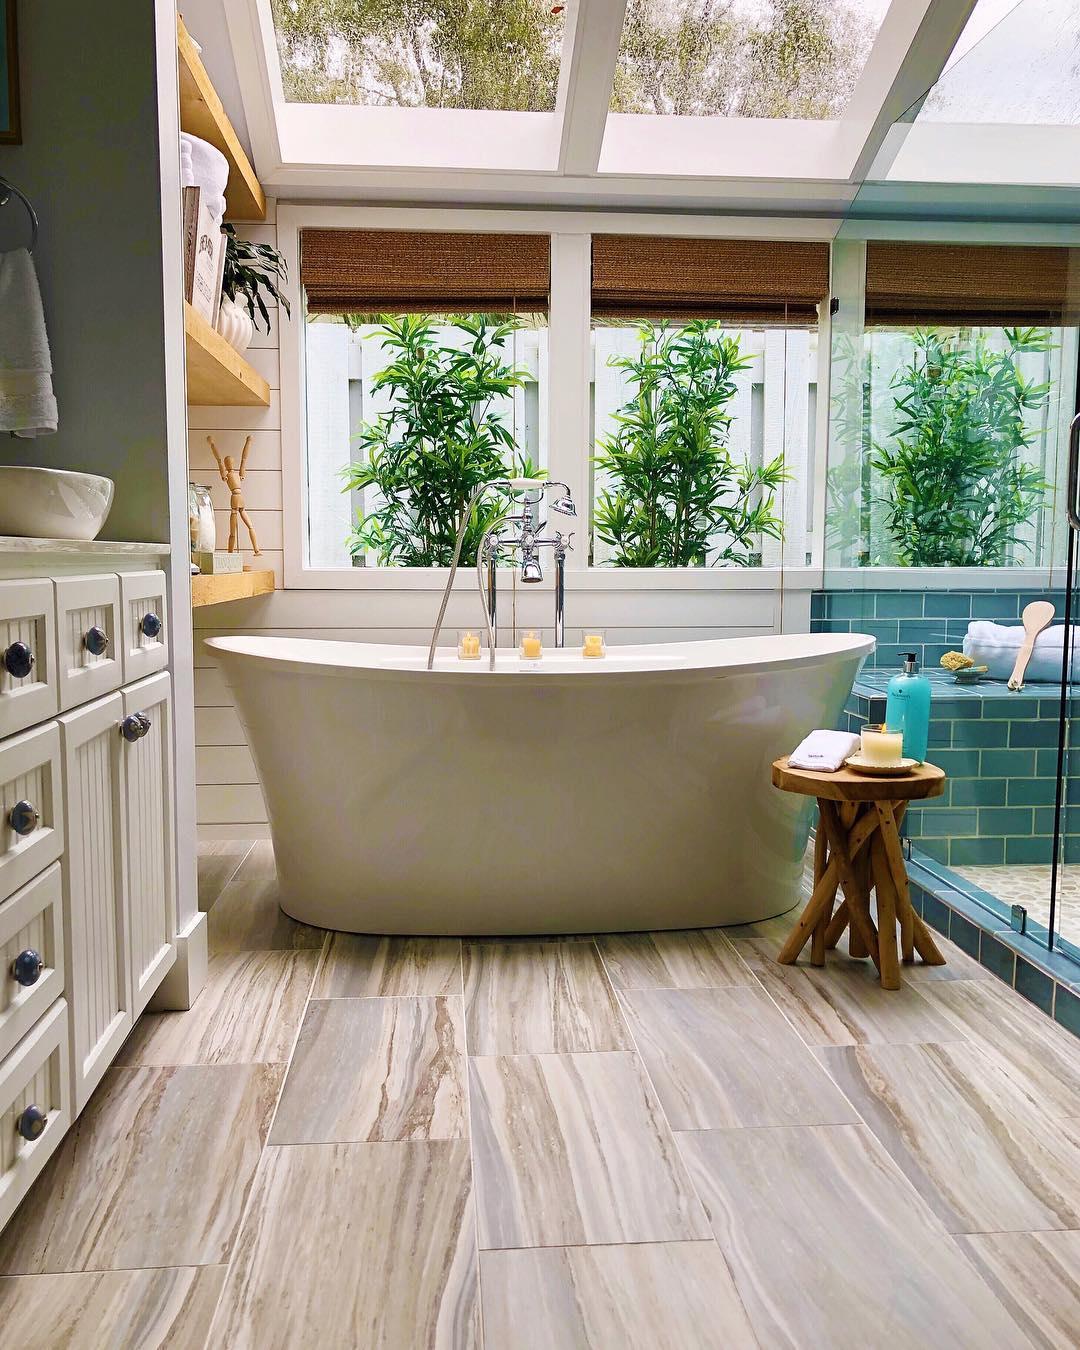 Overcast Bathroom Remodel Ideas